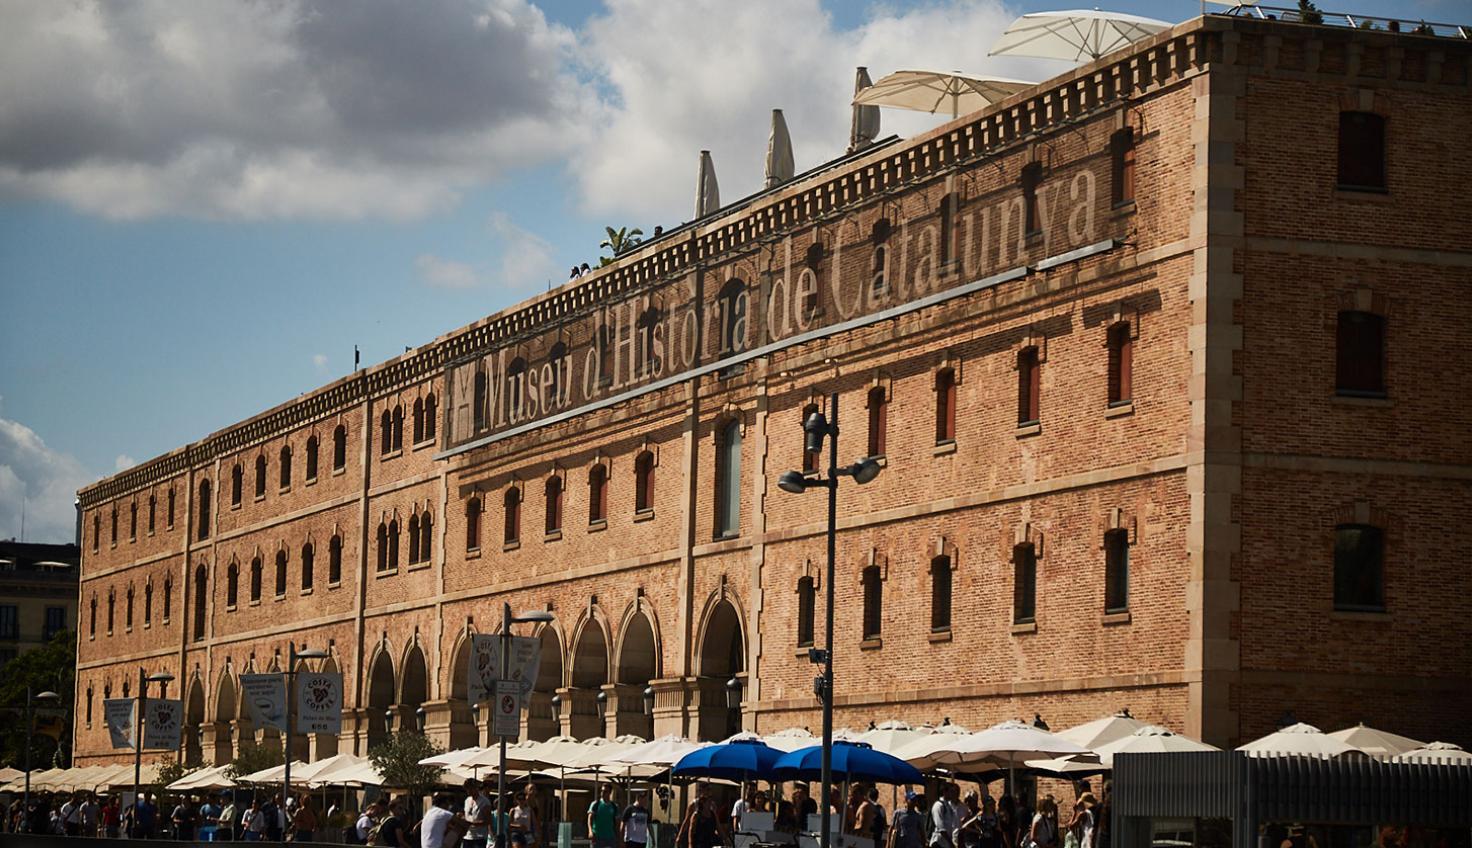 Photo History Museum of Catalonia